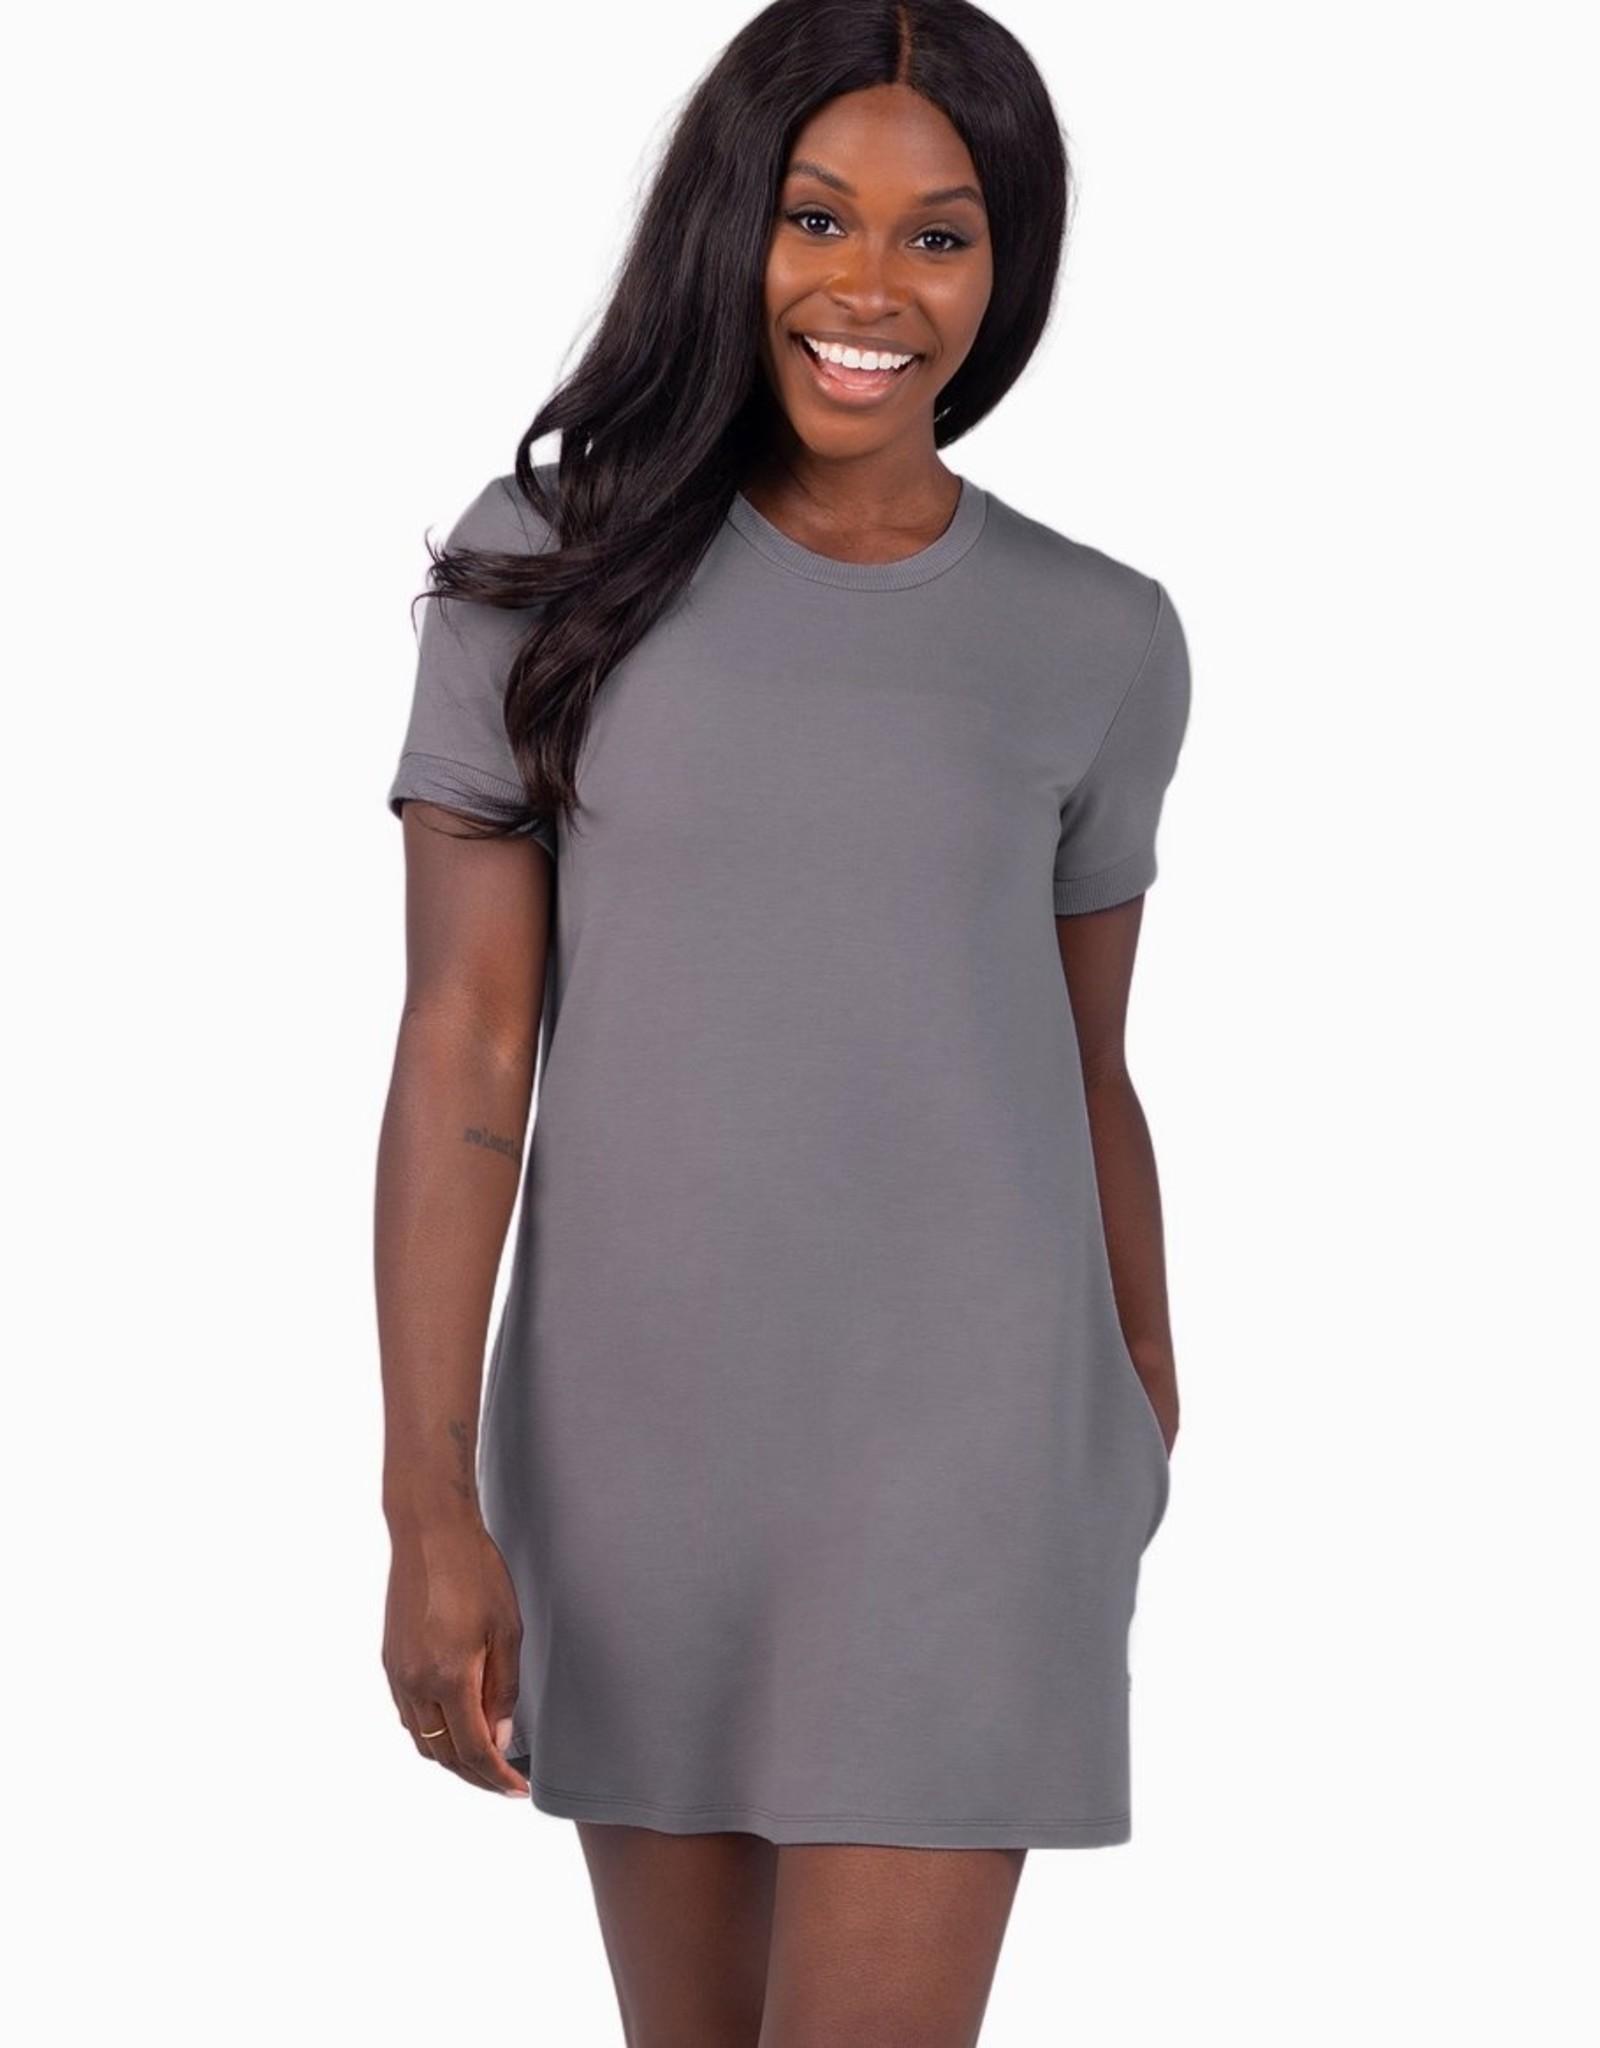 Southern Shirt Campus Dress/2D007